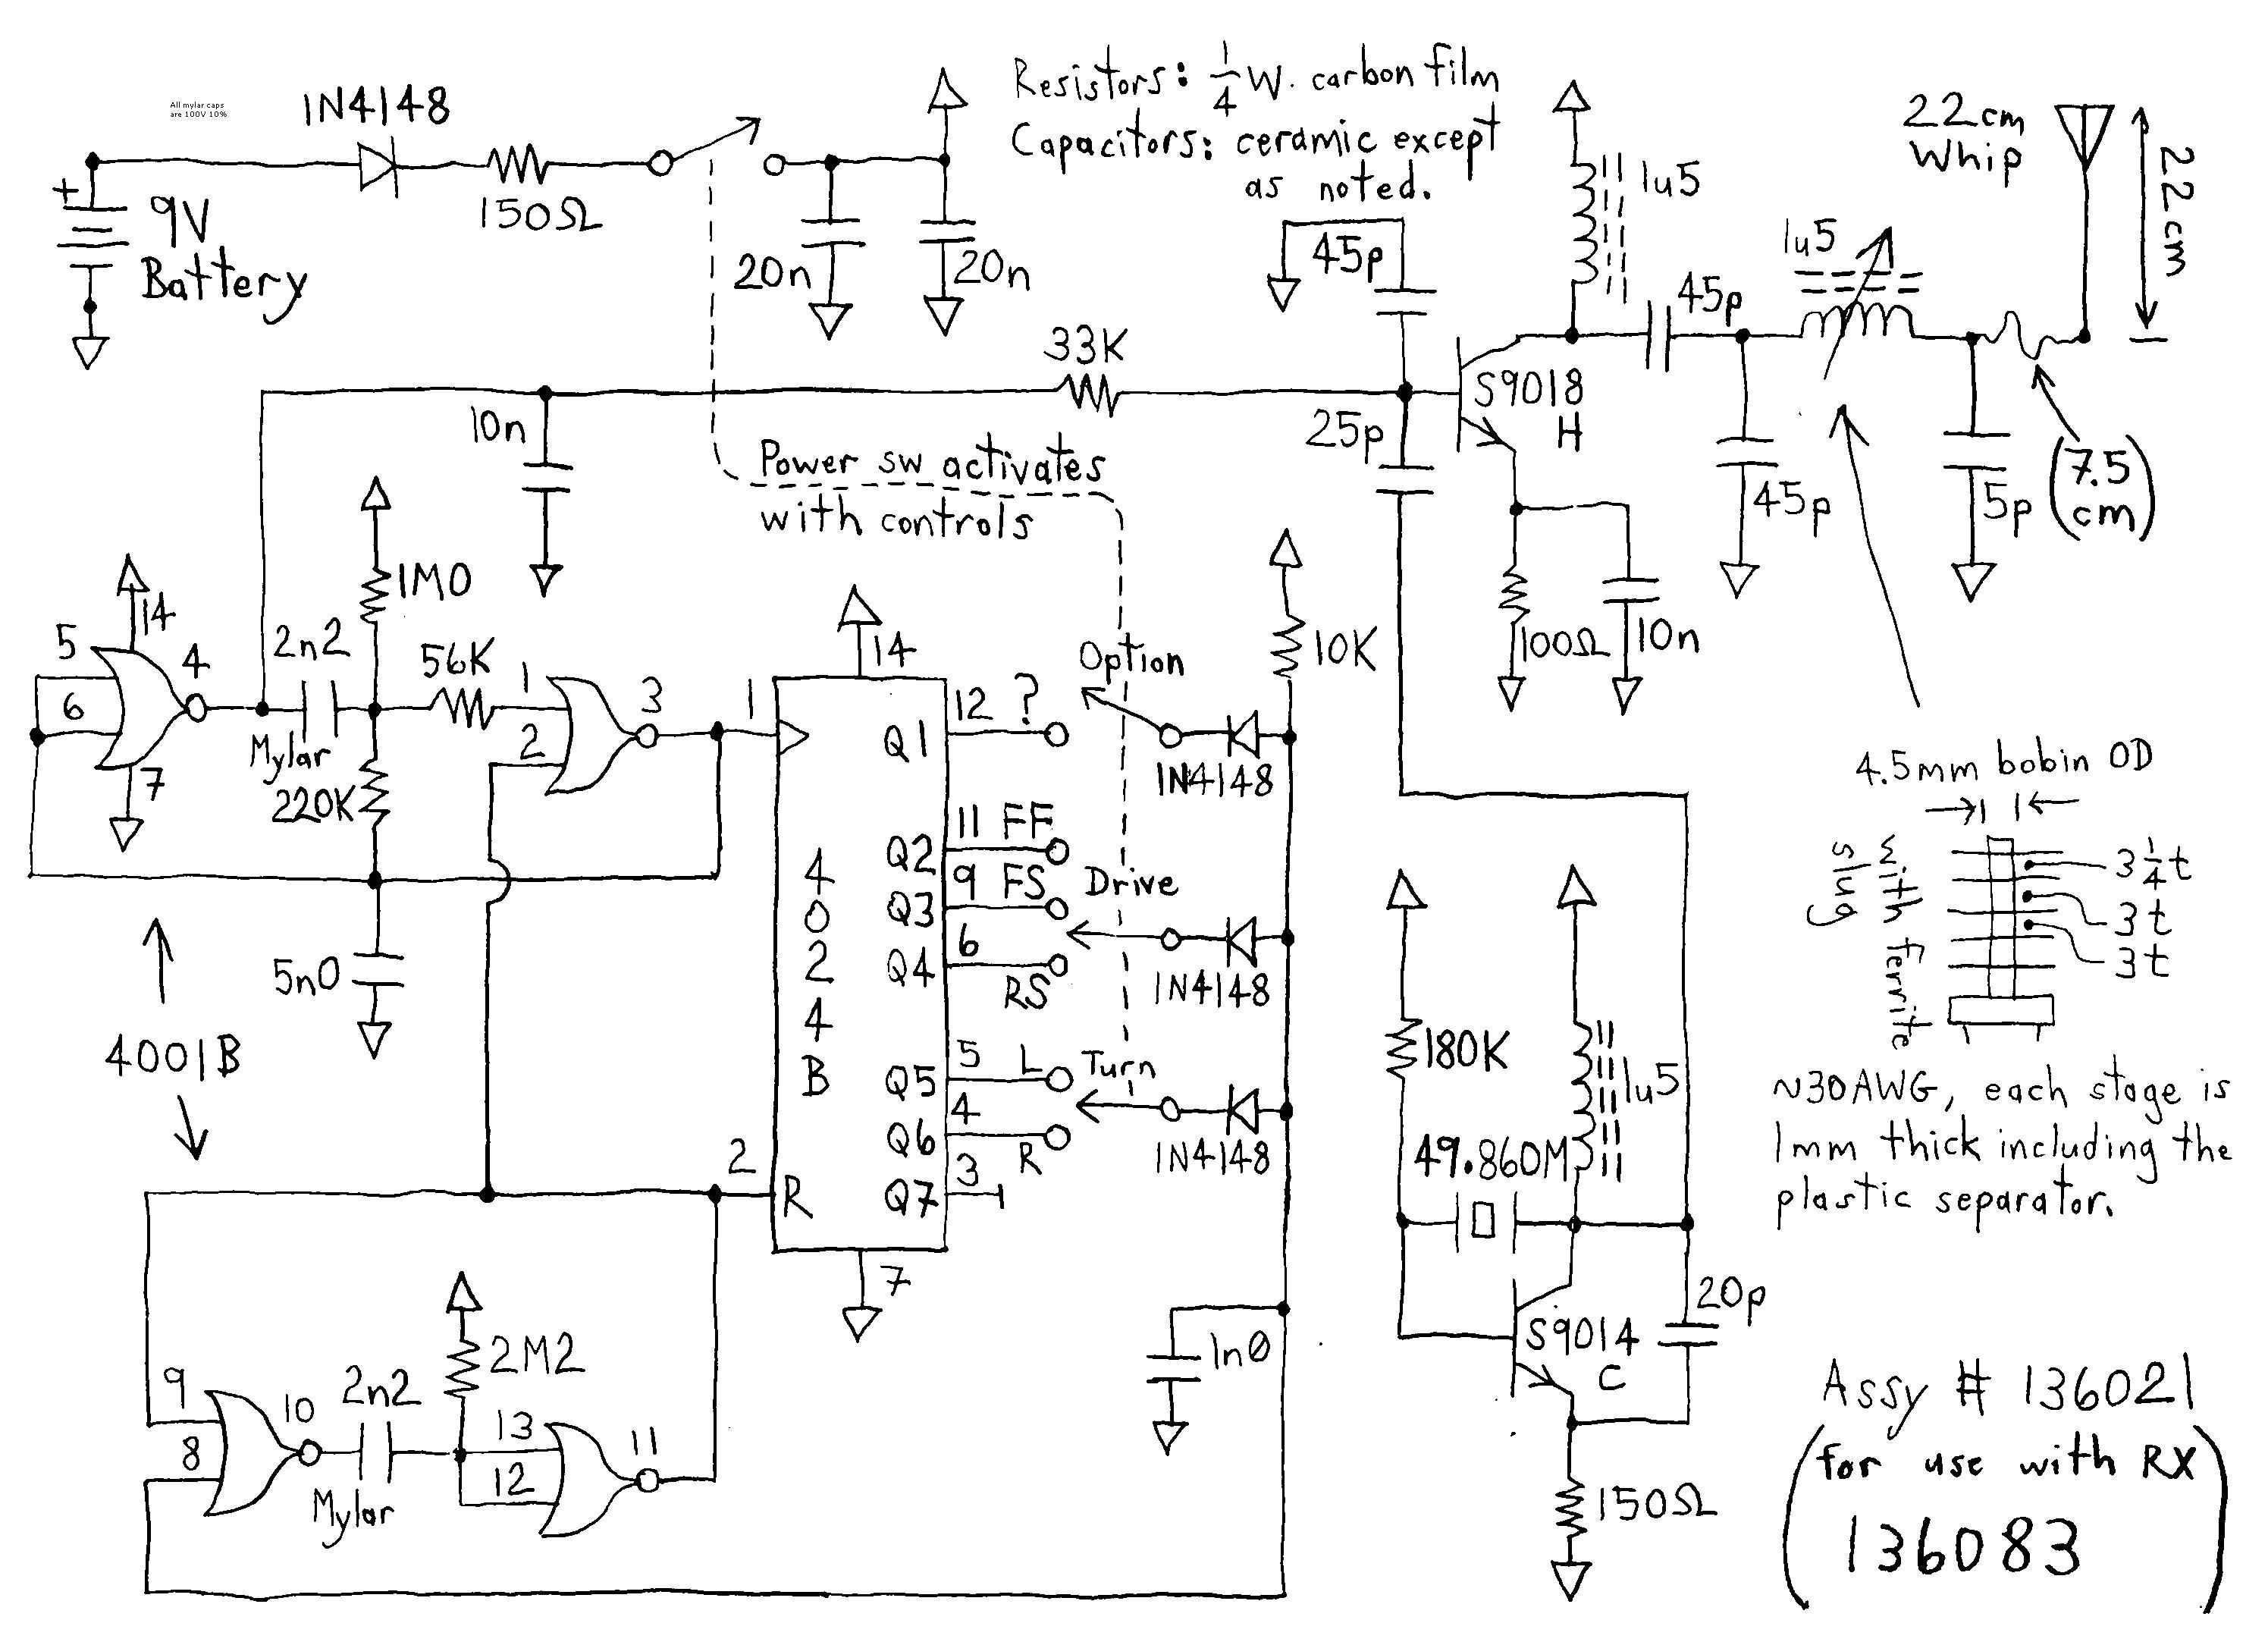 Car Electrical Wiring Diagram Automotive Wiring Diagram Symbols Inspirational Electronic Circuits Of Car Electrical Wiring Diagram